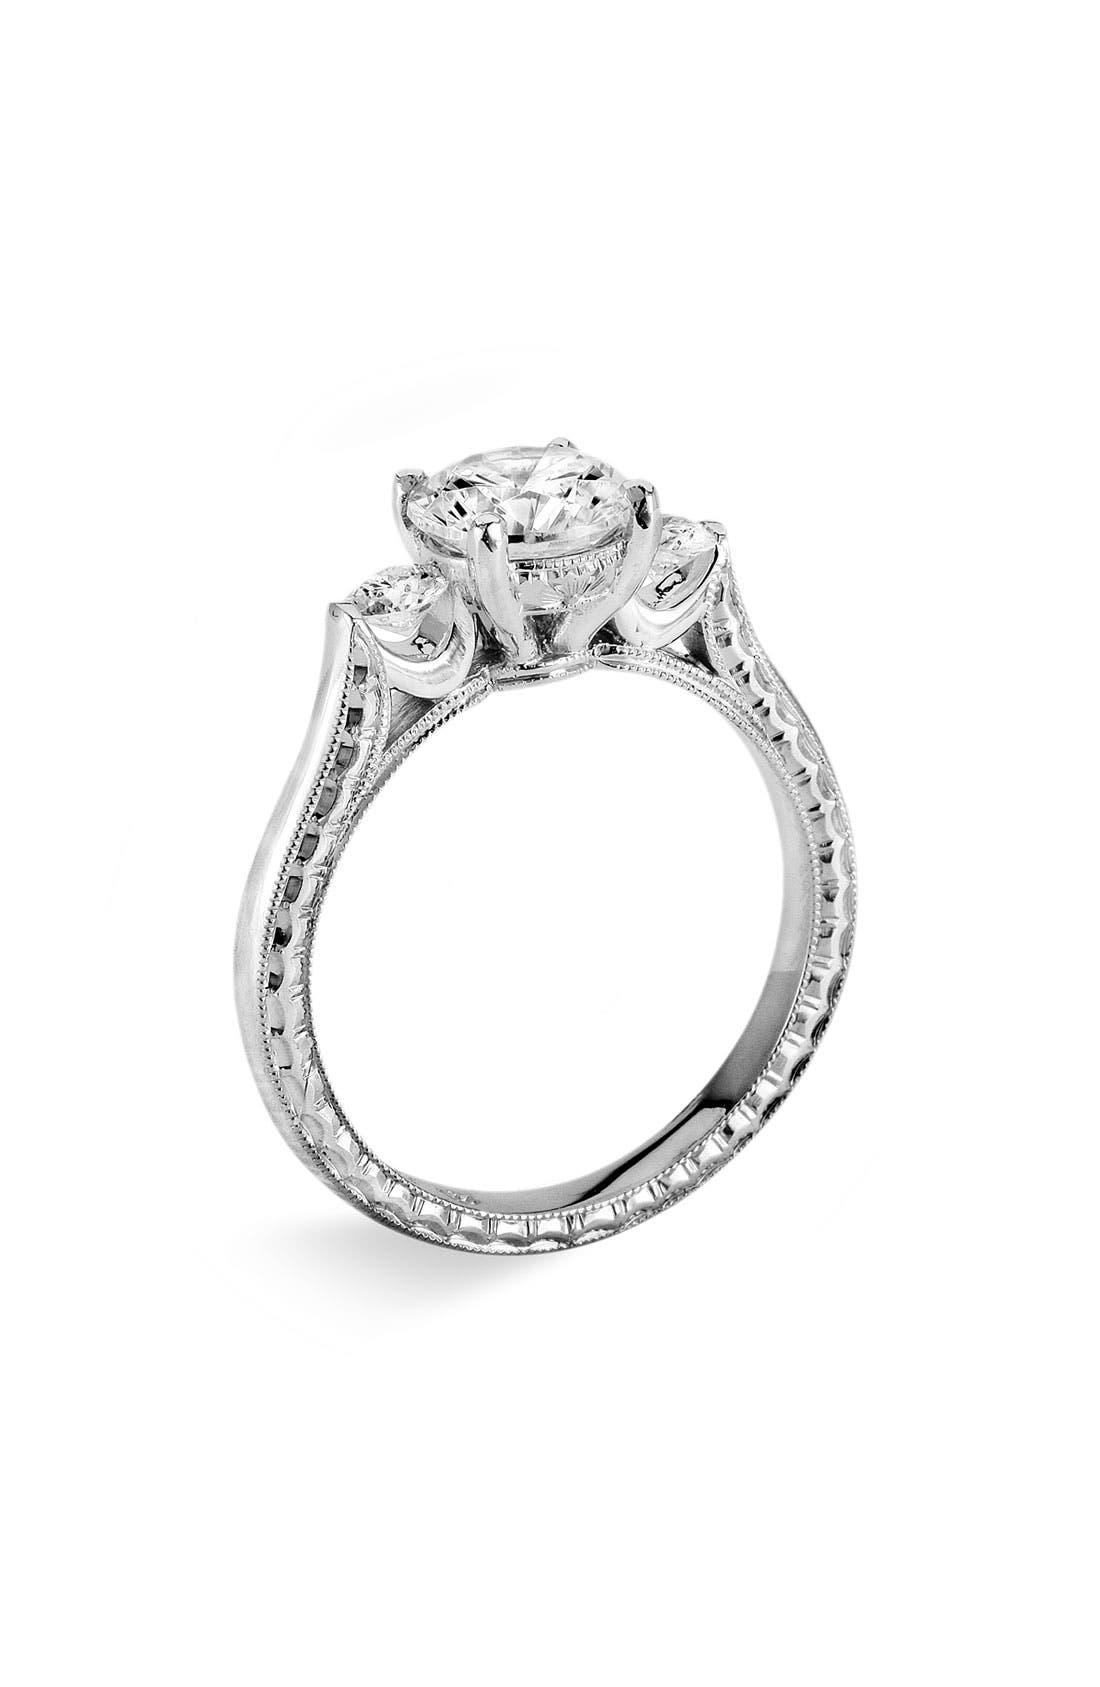 Main Image - Jack Kelége 'Silhouette' Platinum 3-Stone Engagement Ring Setting